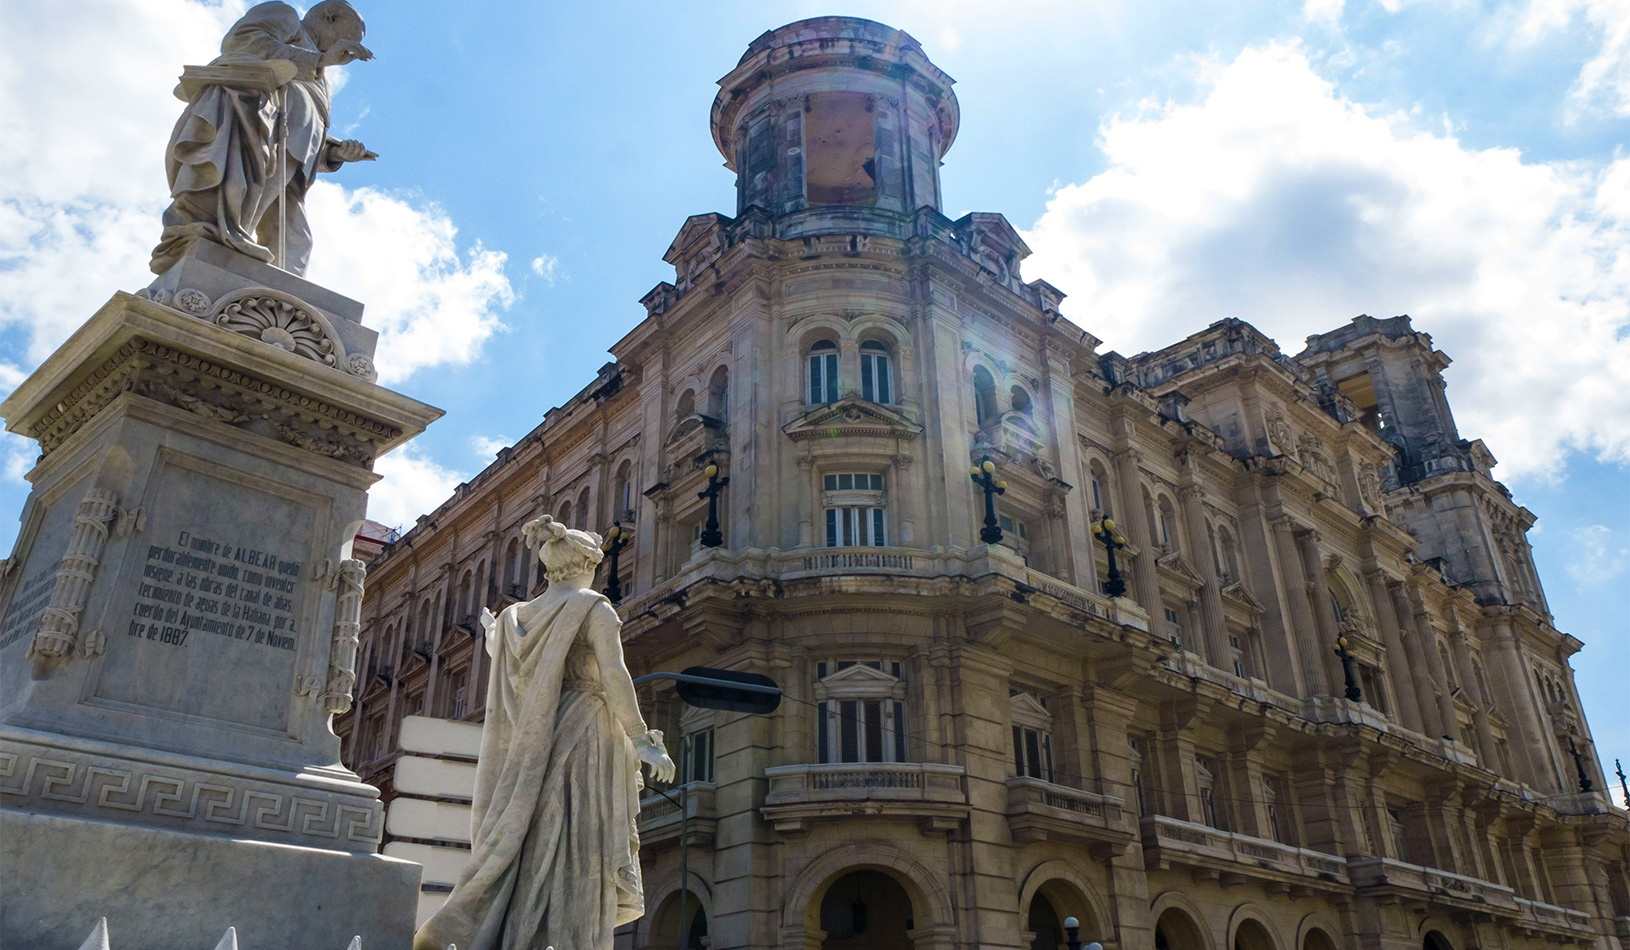 The National Museum of Fine Arts of Havana